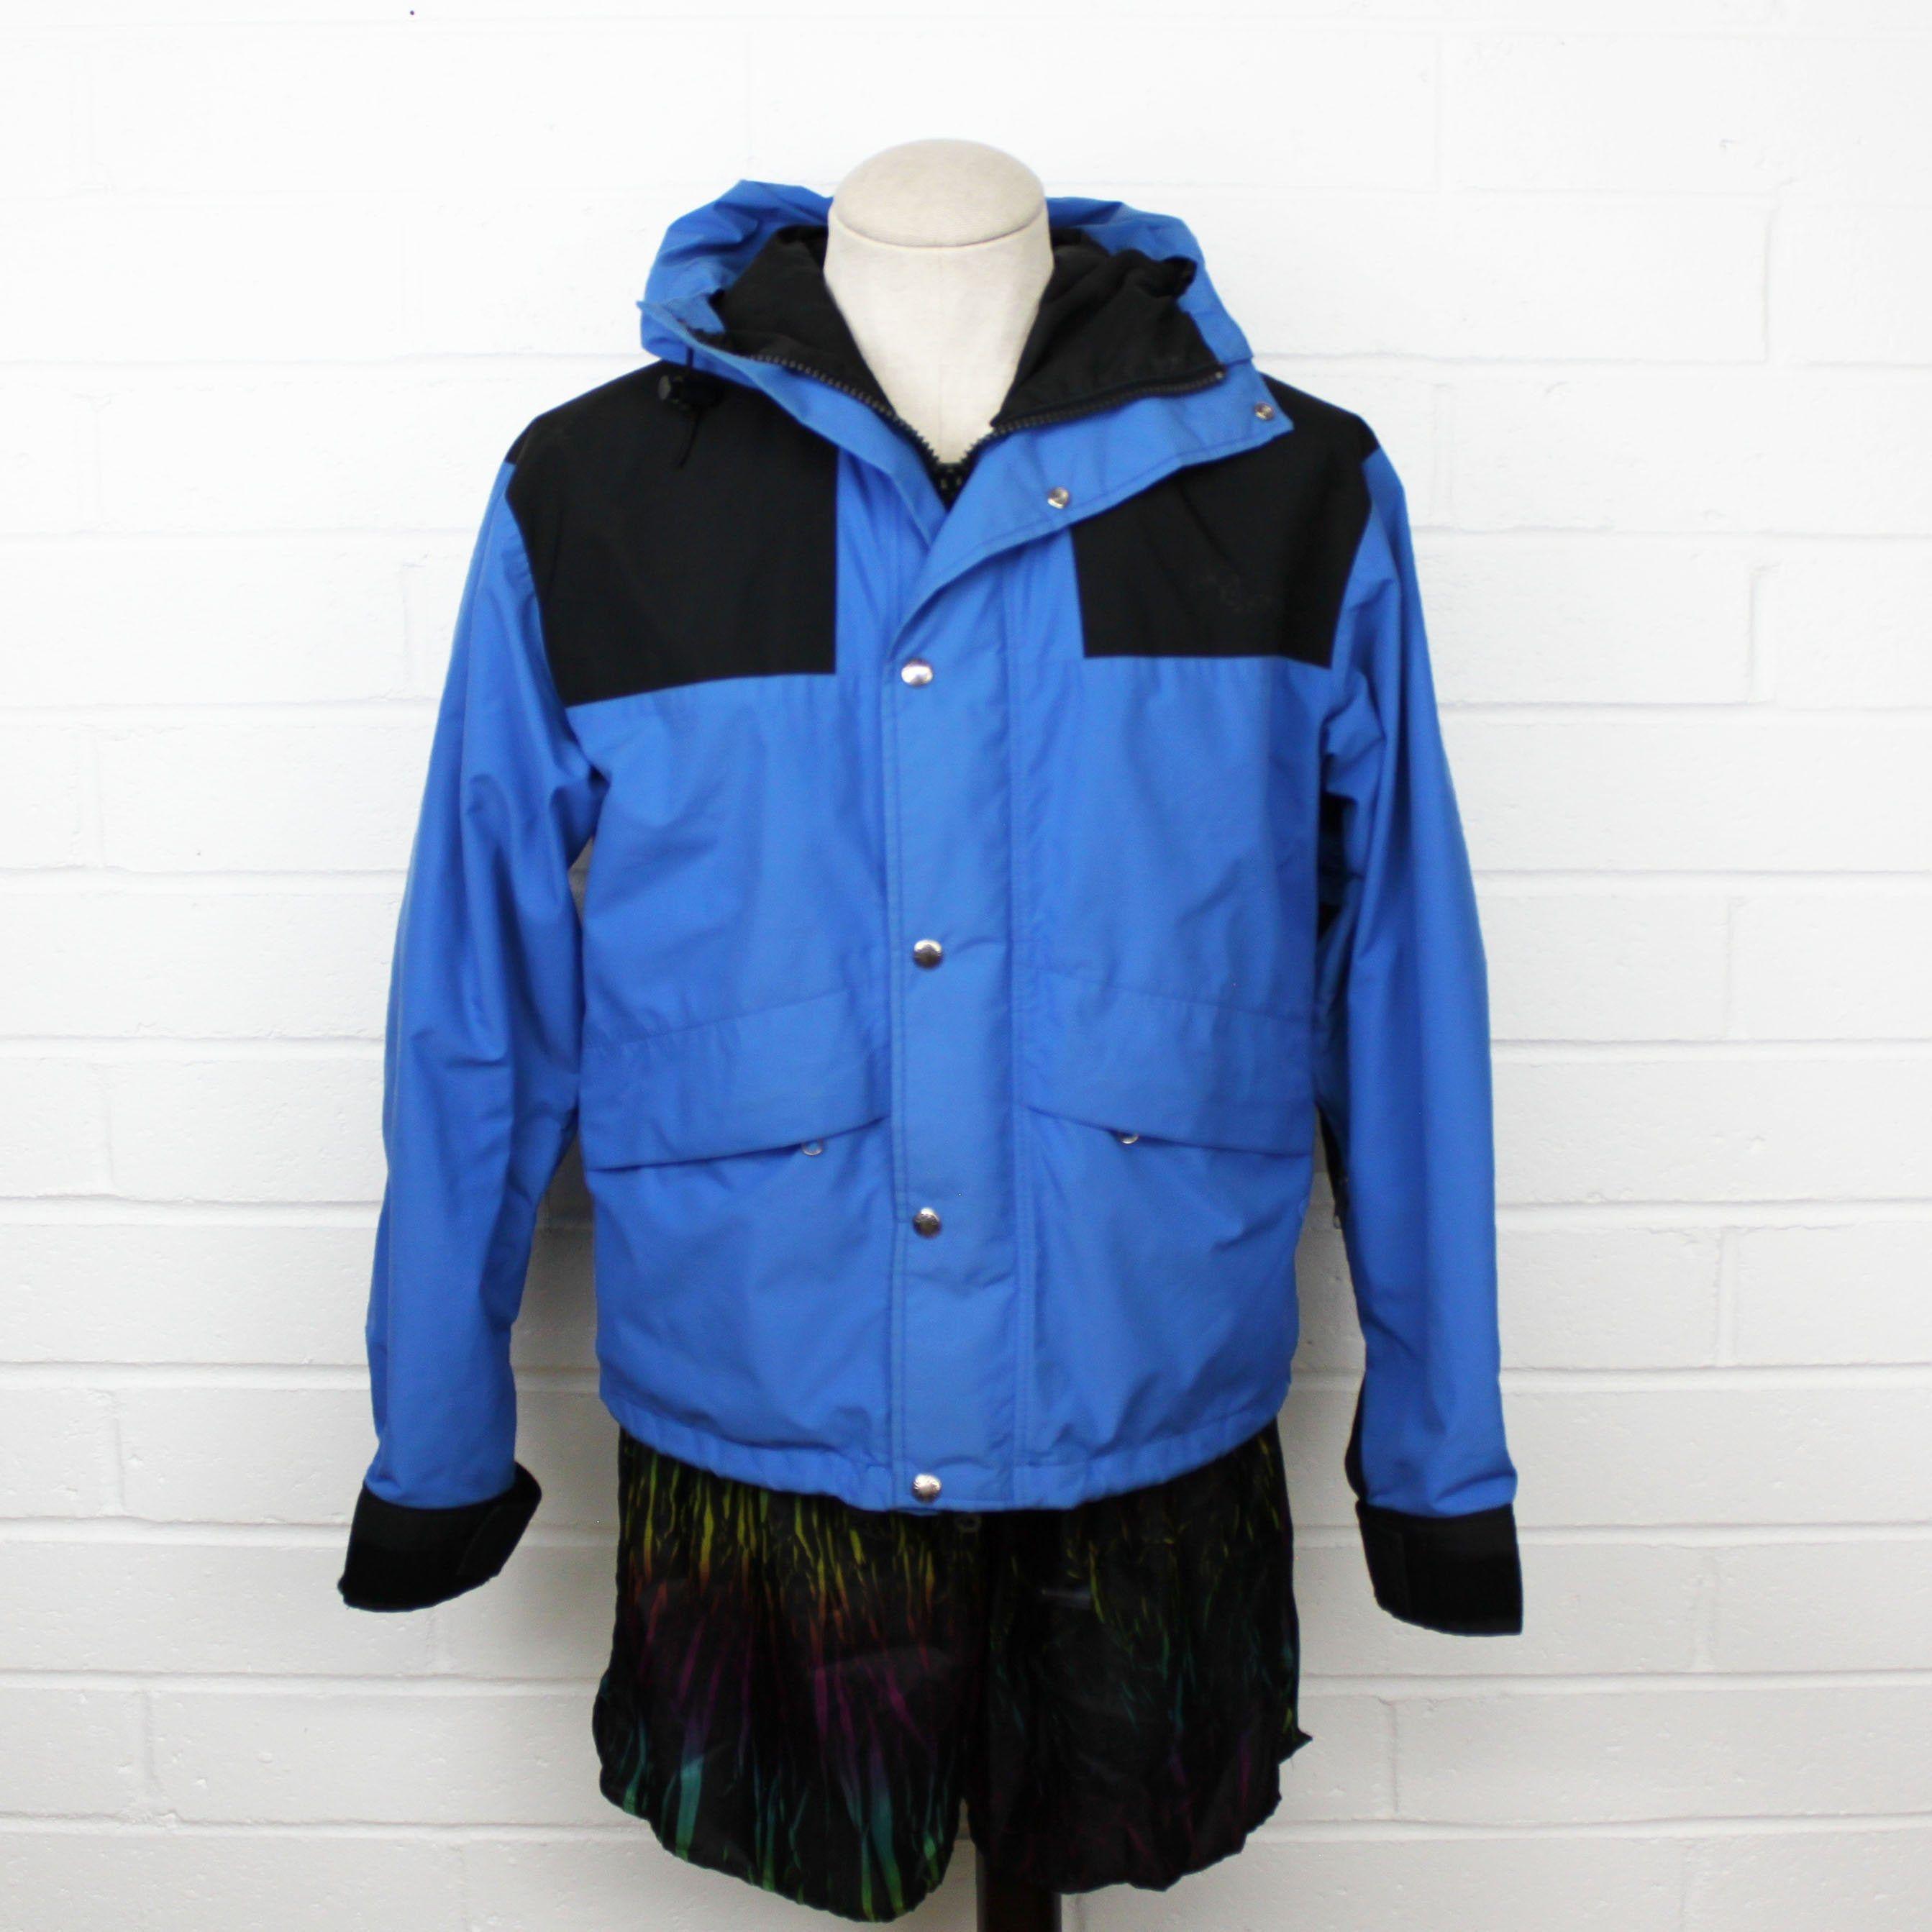 Vintage 80s The North Face Jacket Medium Blue Gore Tex Zip Up Etsy North Face Jacket Jackets Vintage Jacket [ 2686 x 2686 Pixel ]